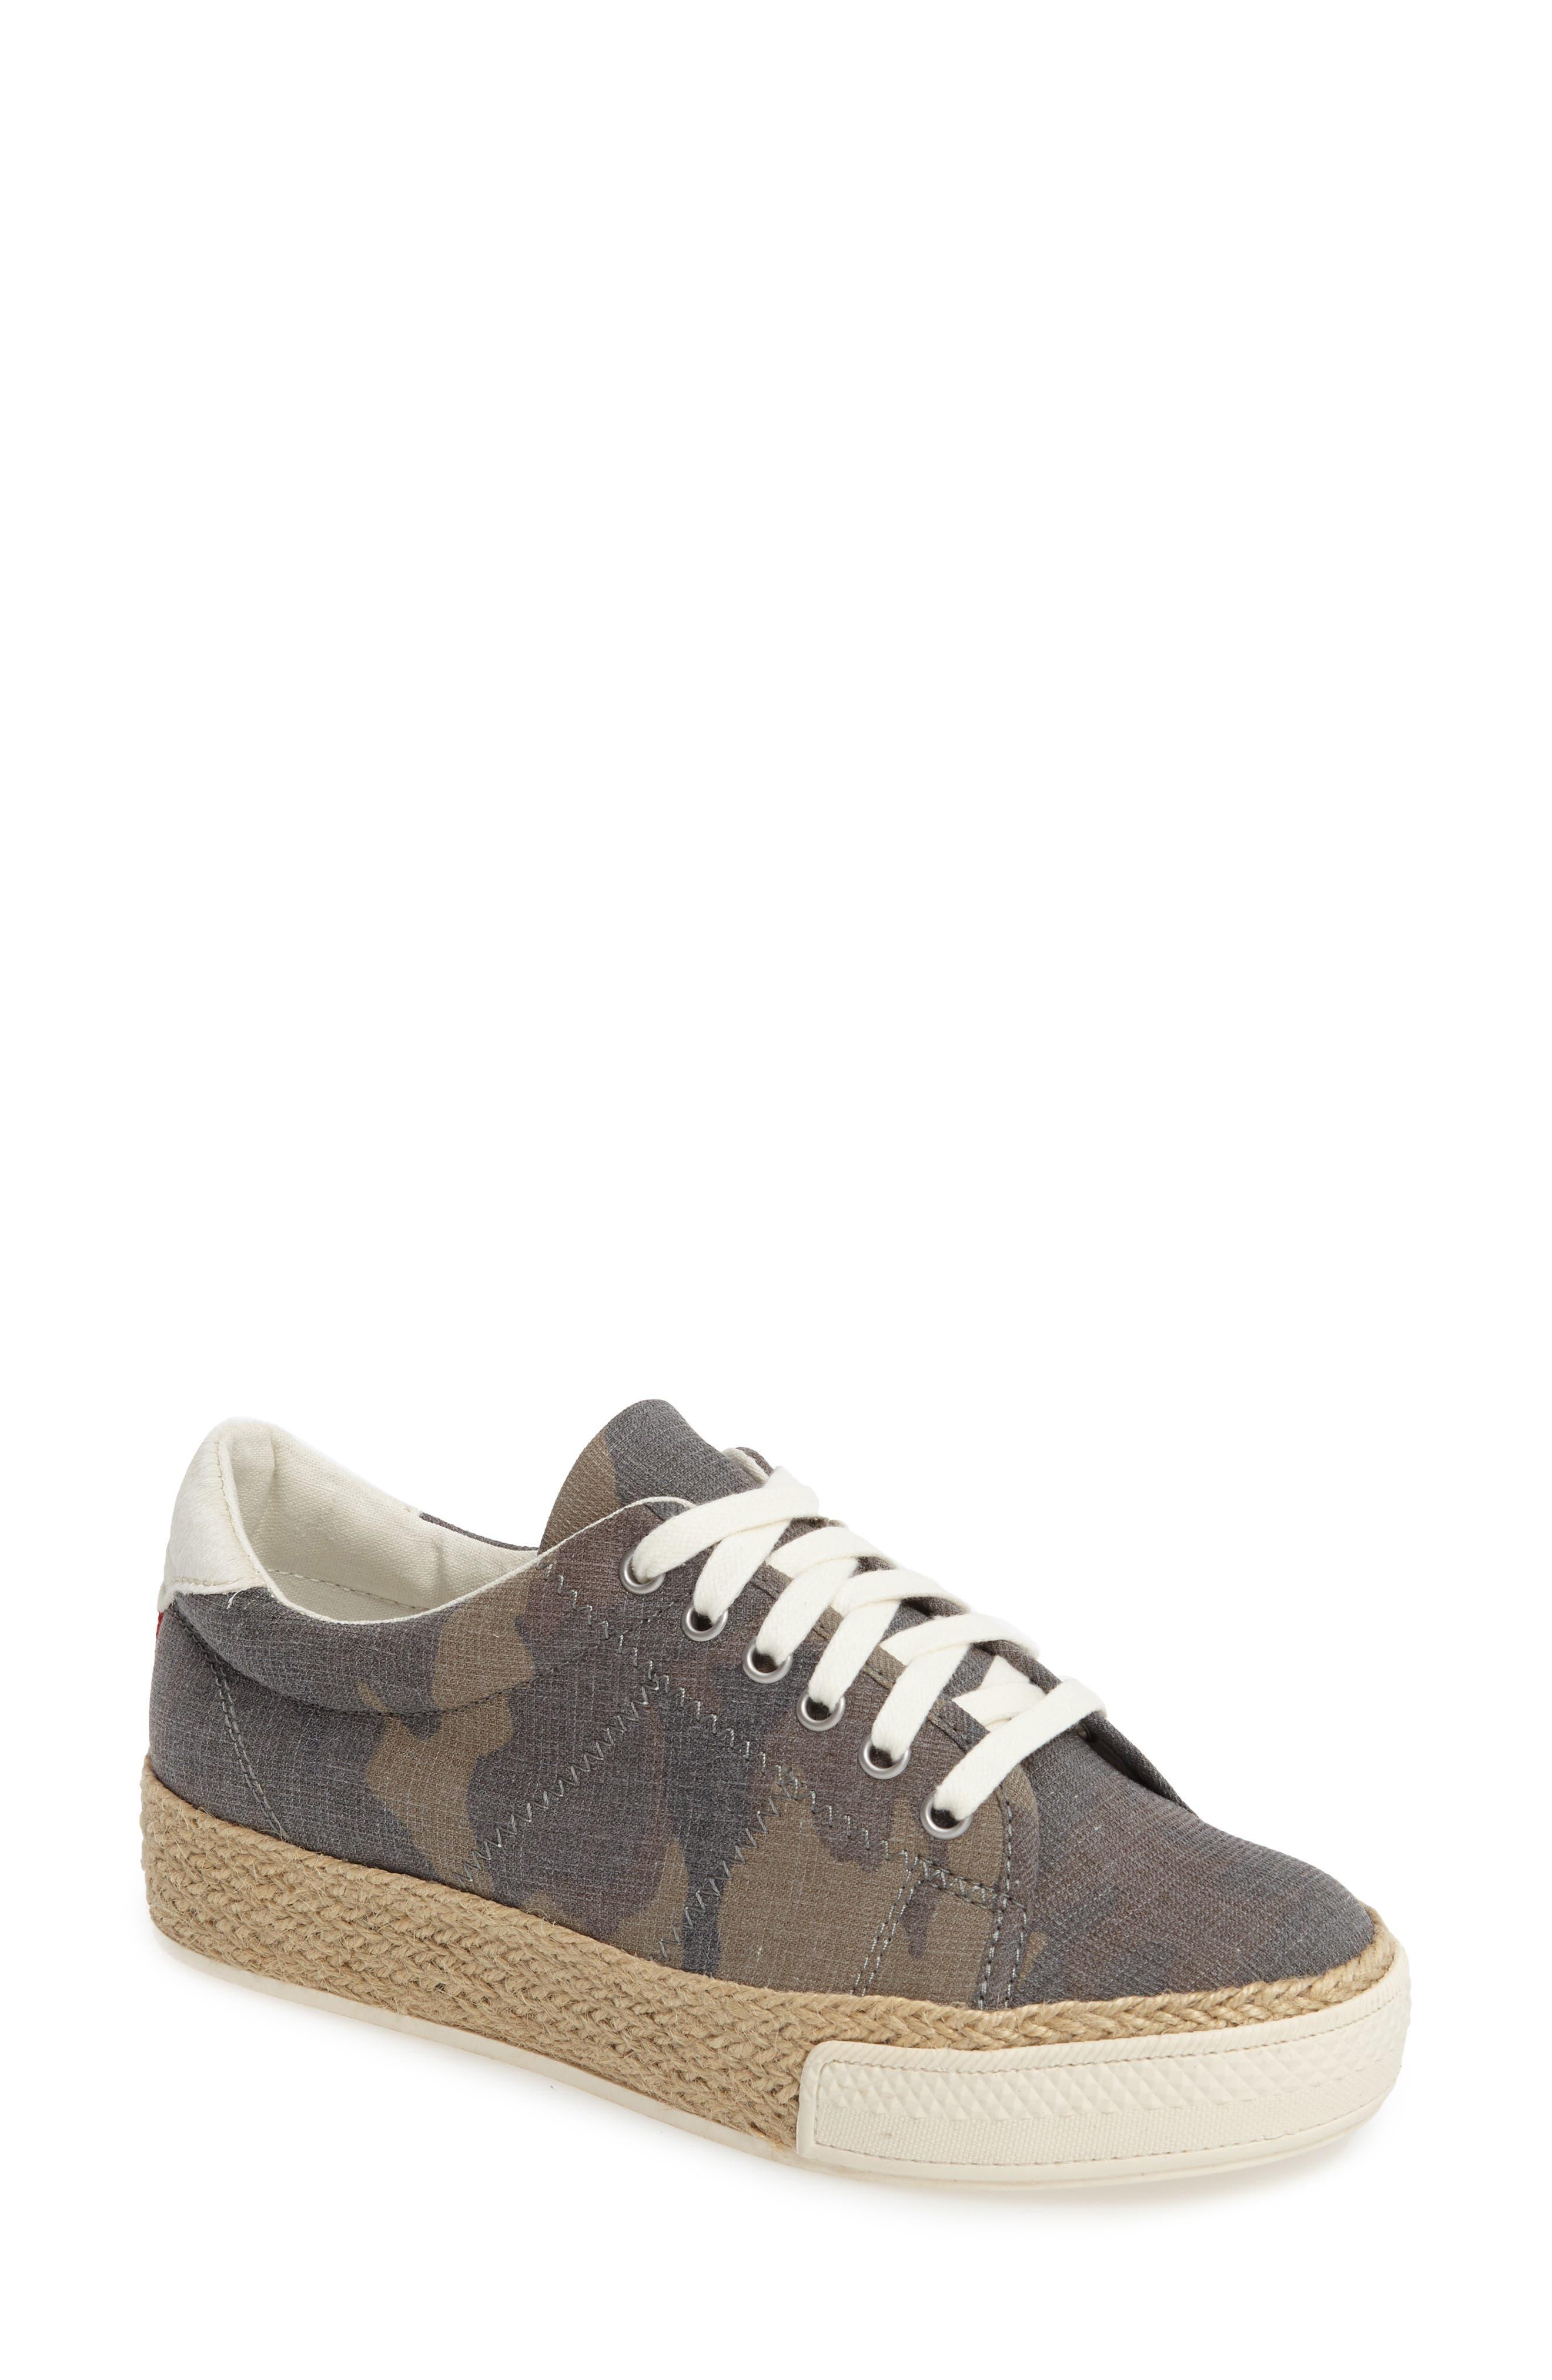 Main Image - Dolce Vita Tala Platform Sneaker (Women)